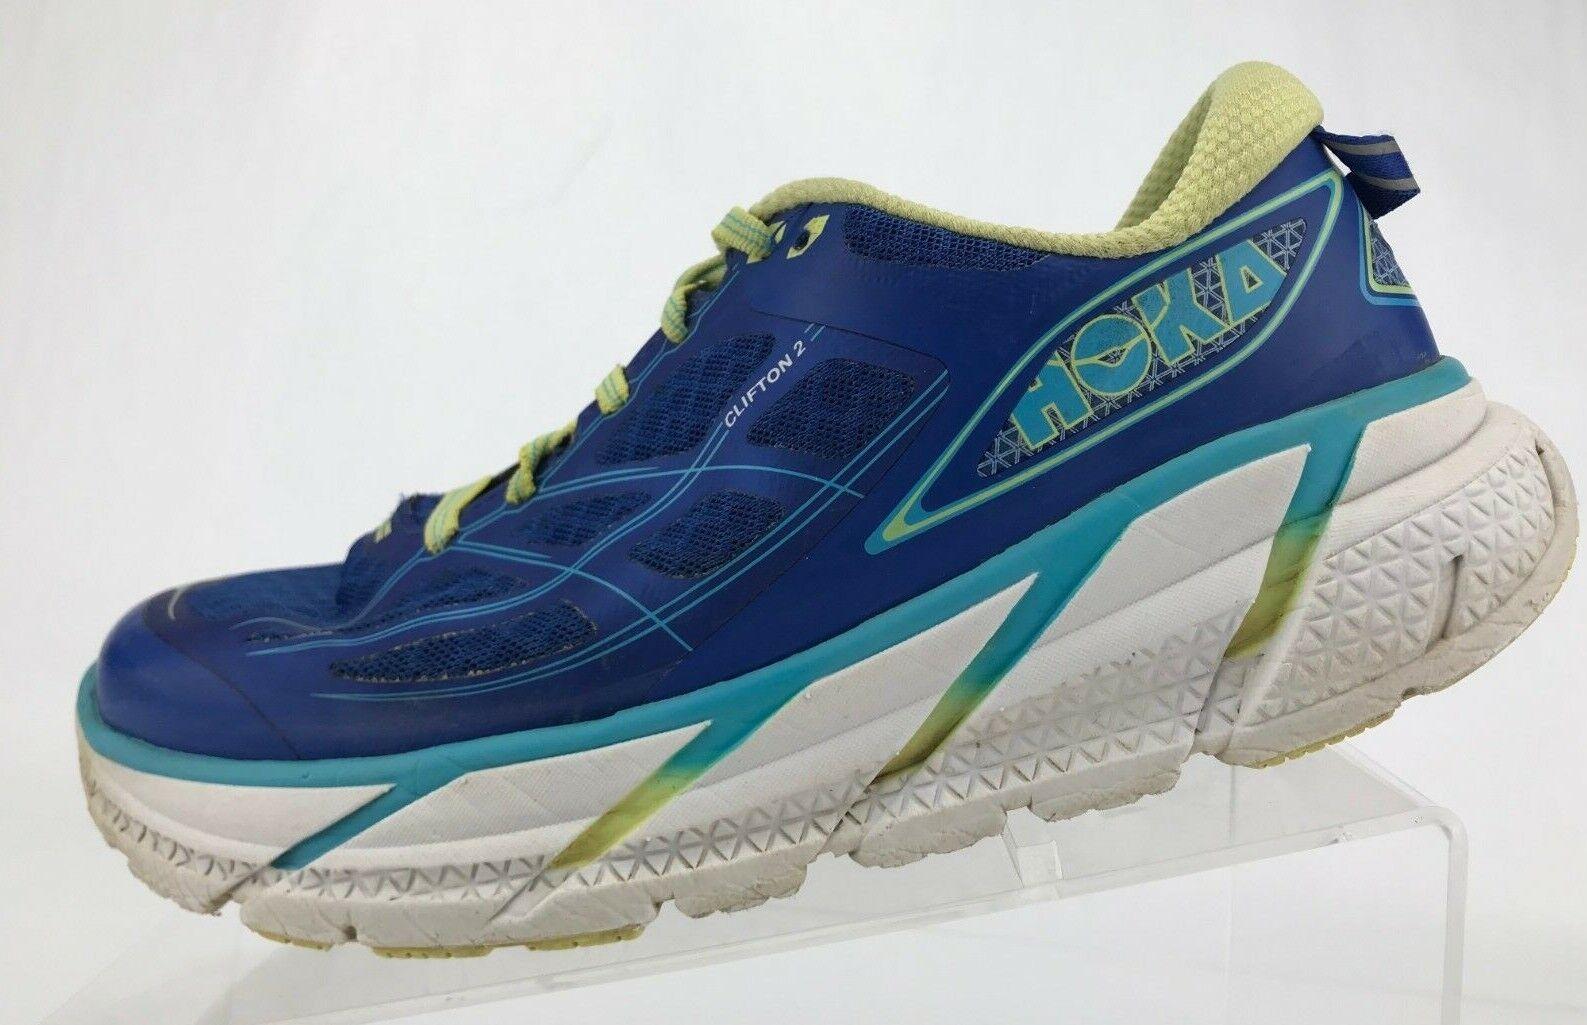 Hoka One One Clifton 2 Running Turnschuhe Blau Training Fitness schuhe damen 8